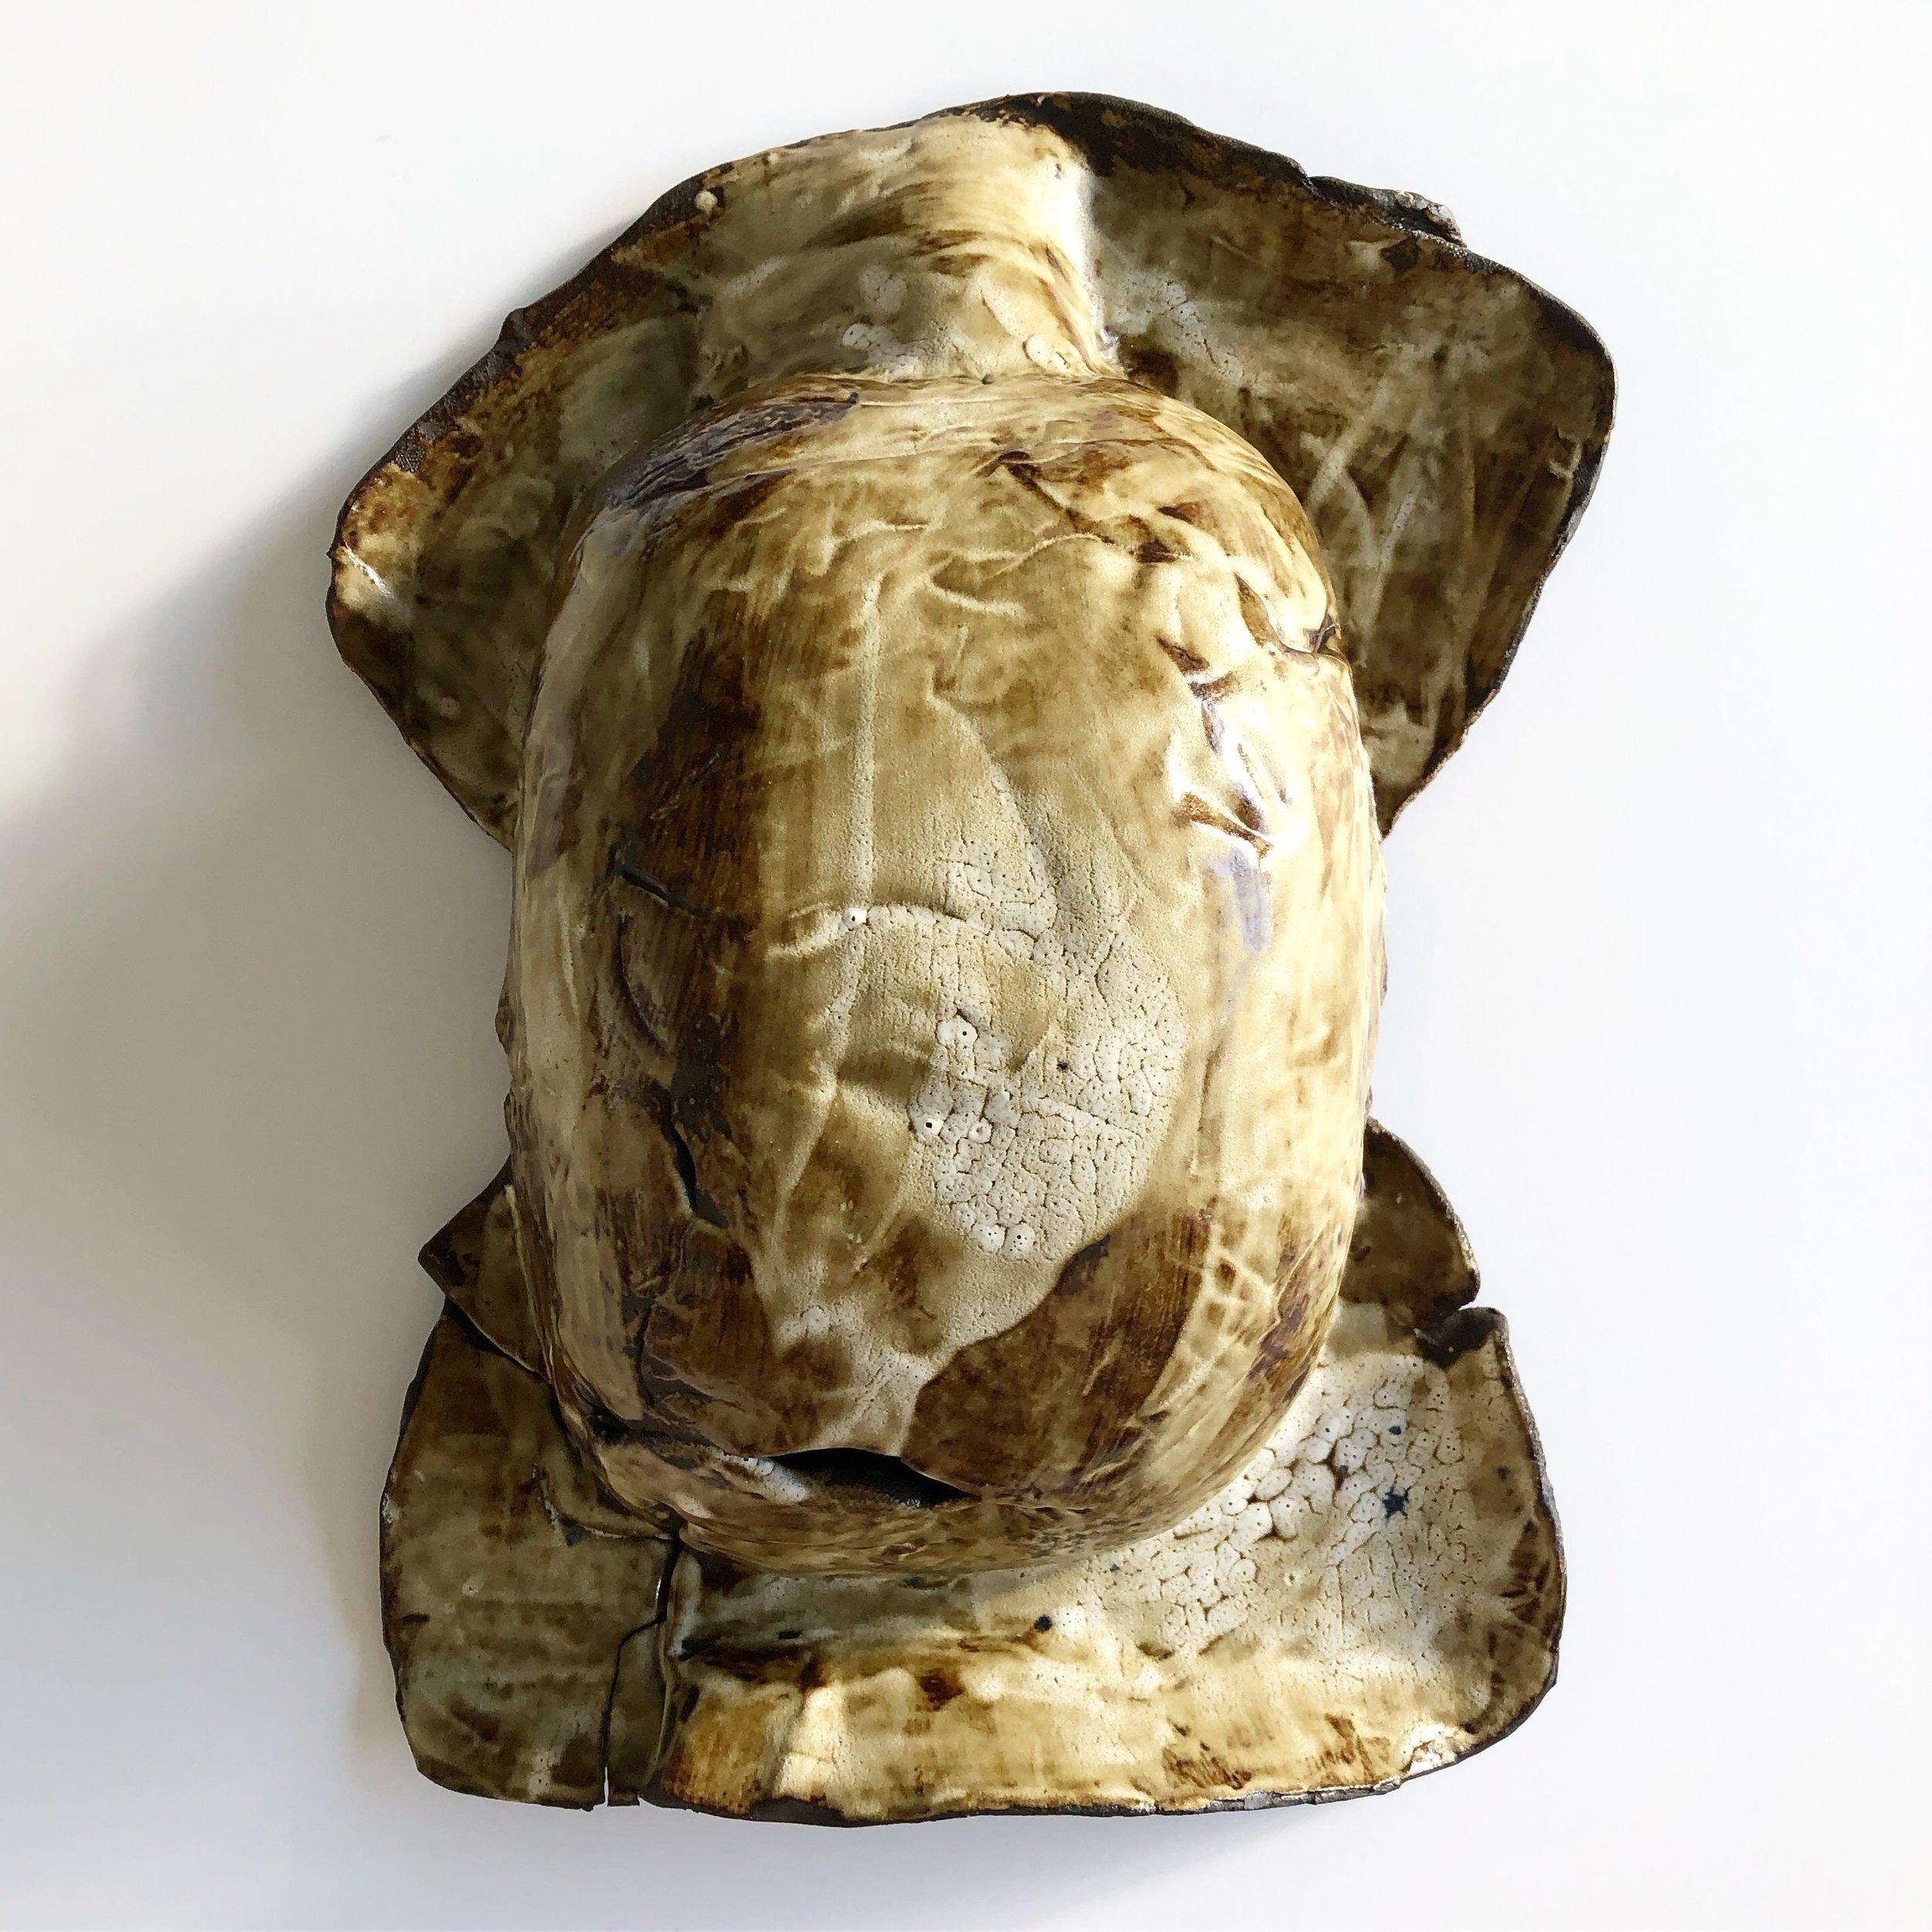 Bread Belly, 2019, glazed ceramic, 18 x 14 x 6 1/2 inches